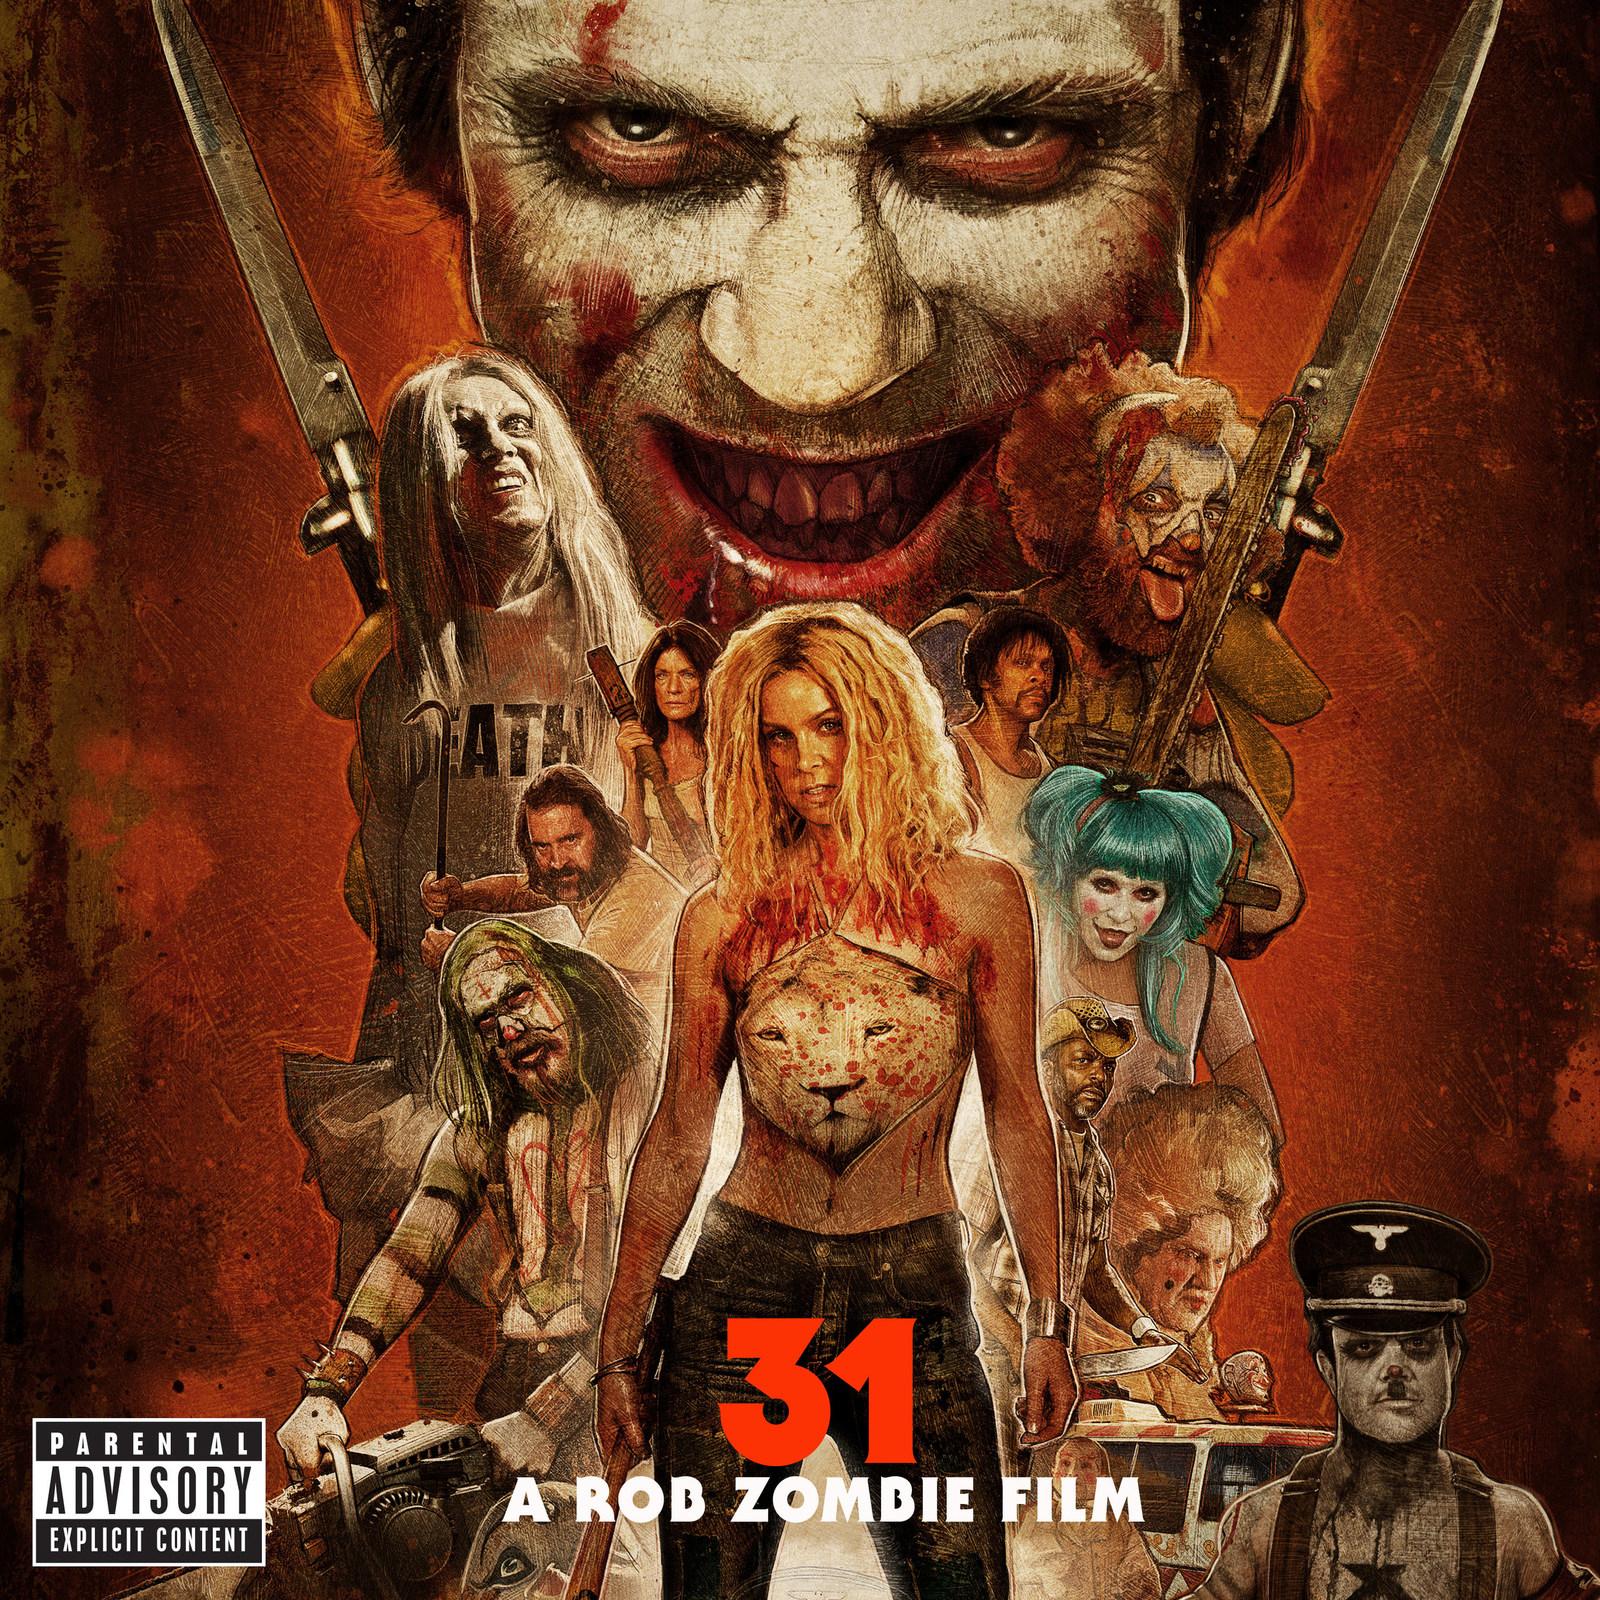 Rob Zombie Unleashes 31 A Rob Zombie Film Original